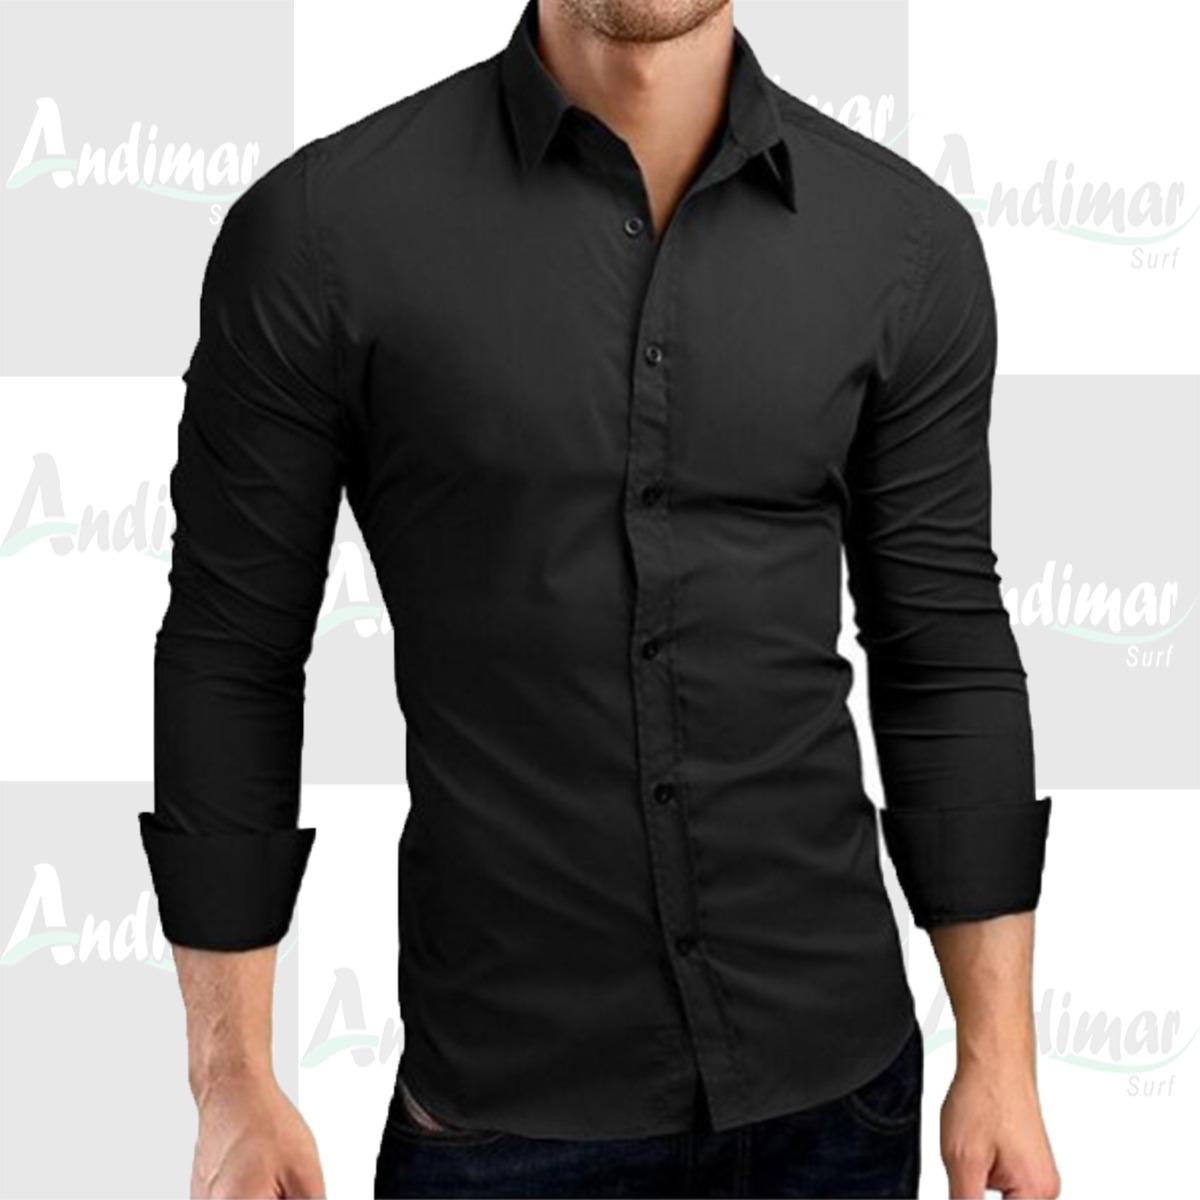 kit 3 camisas masculinas social slim fit preta manga longa. Carregando zoom. 42553ae2d8fdd